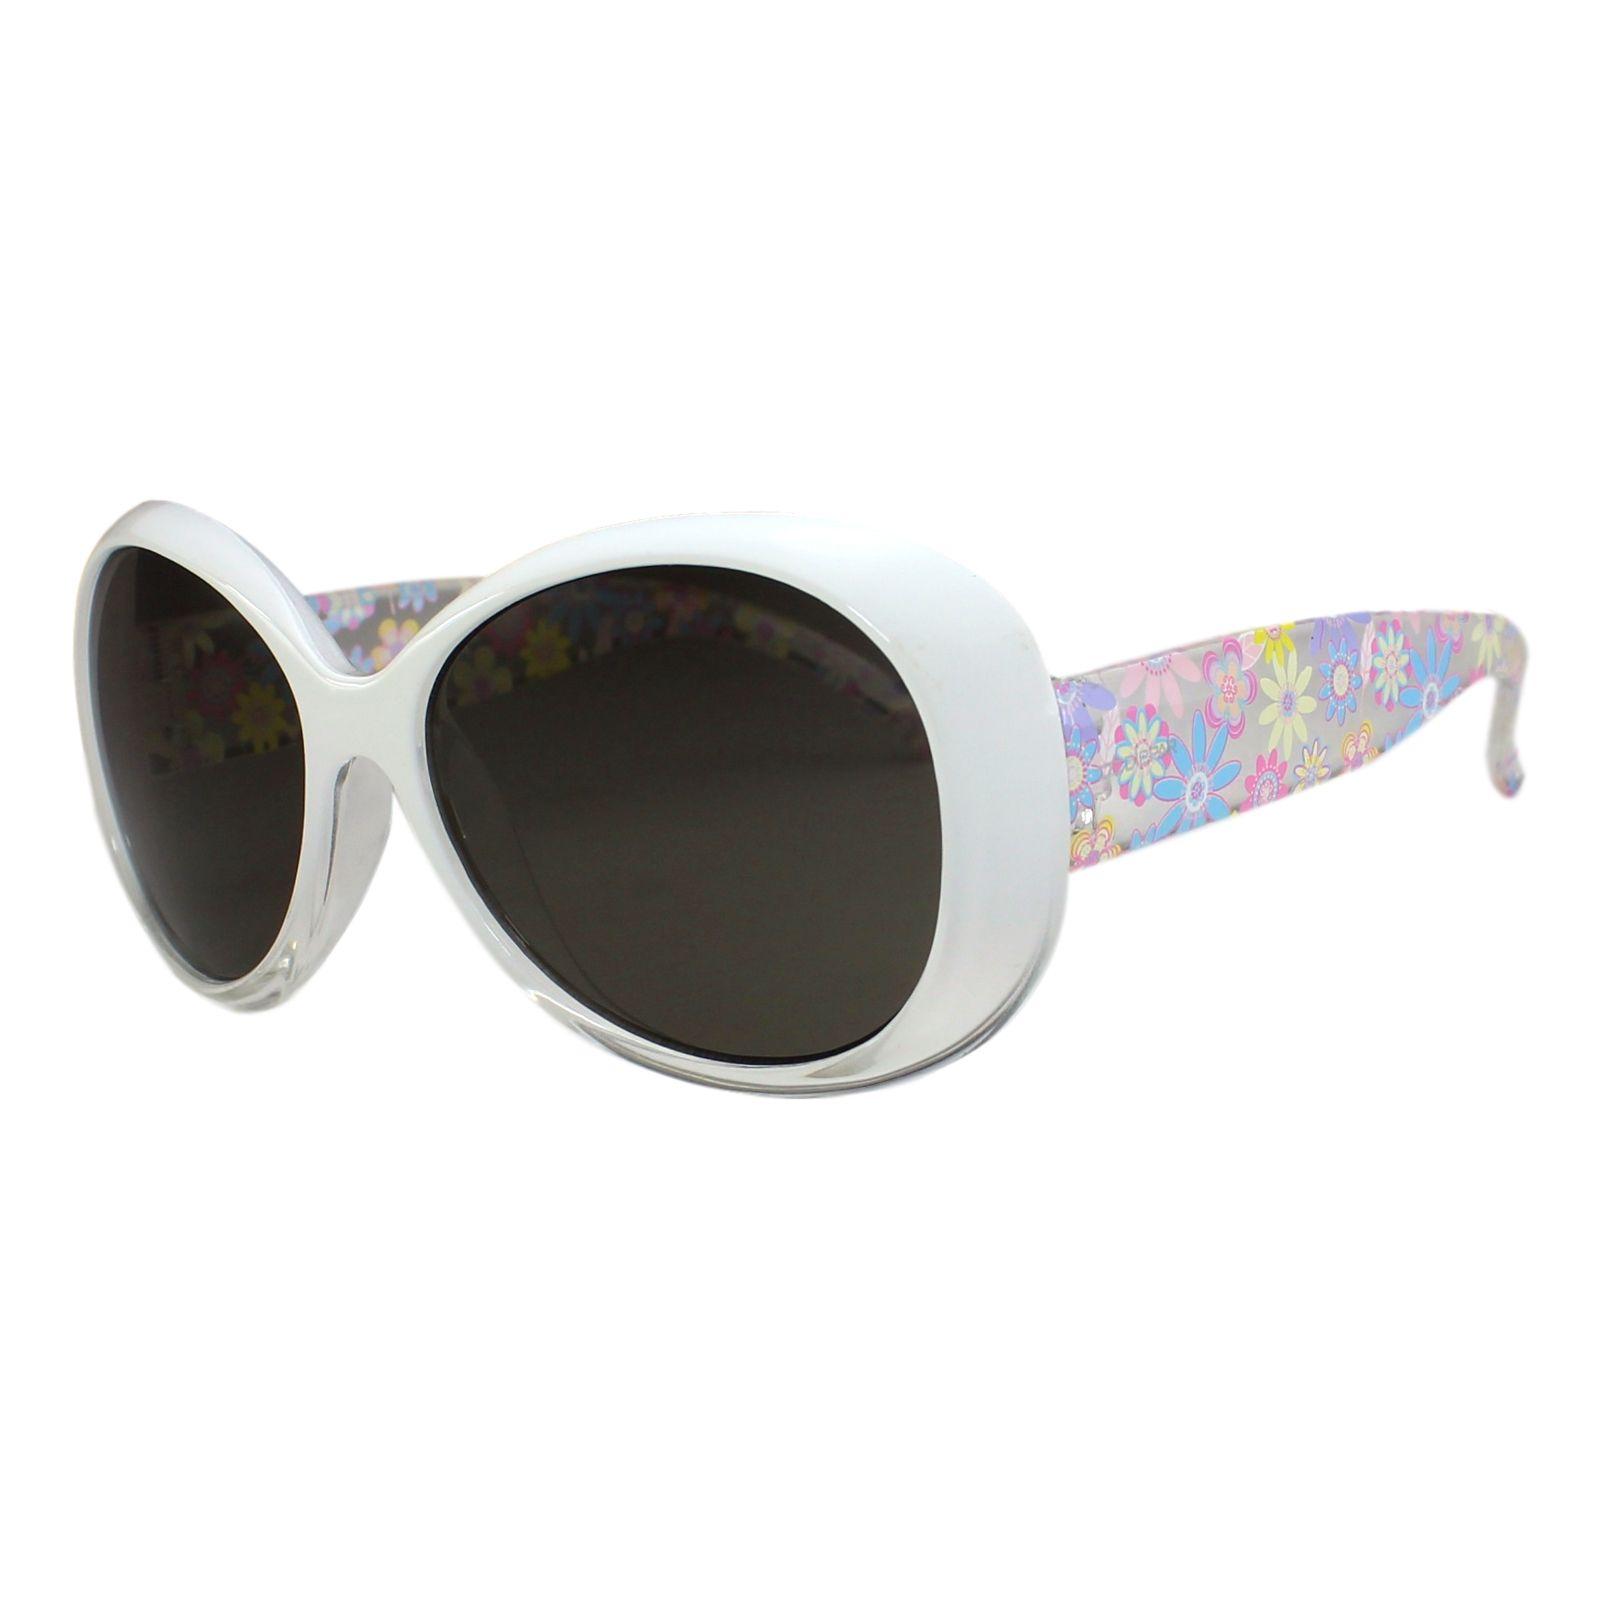 Óculos de Sol Díspar ID1738 infantil - Branco